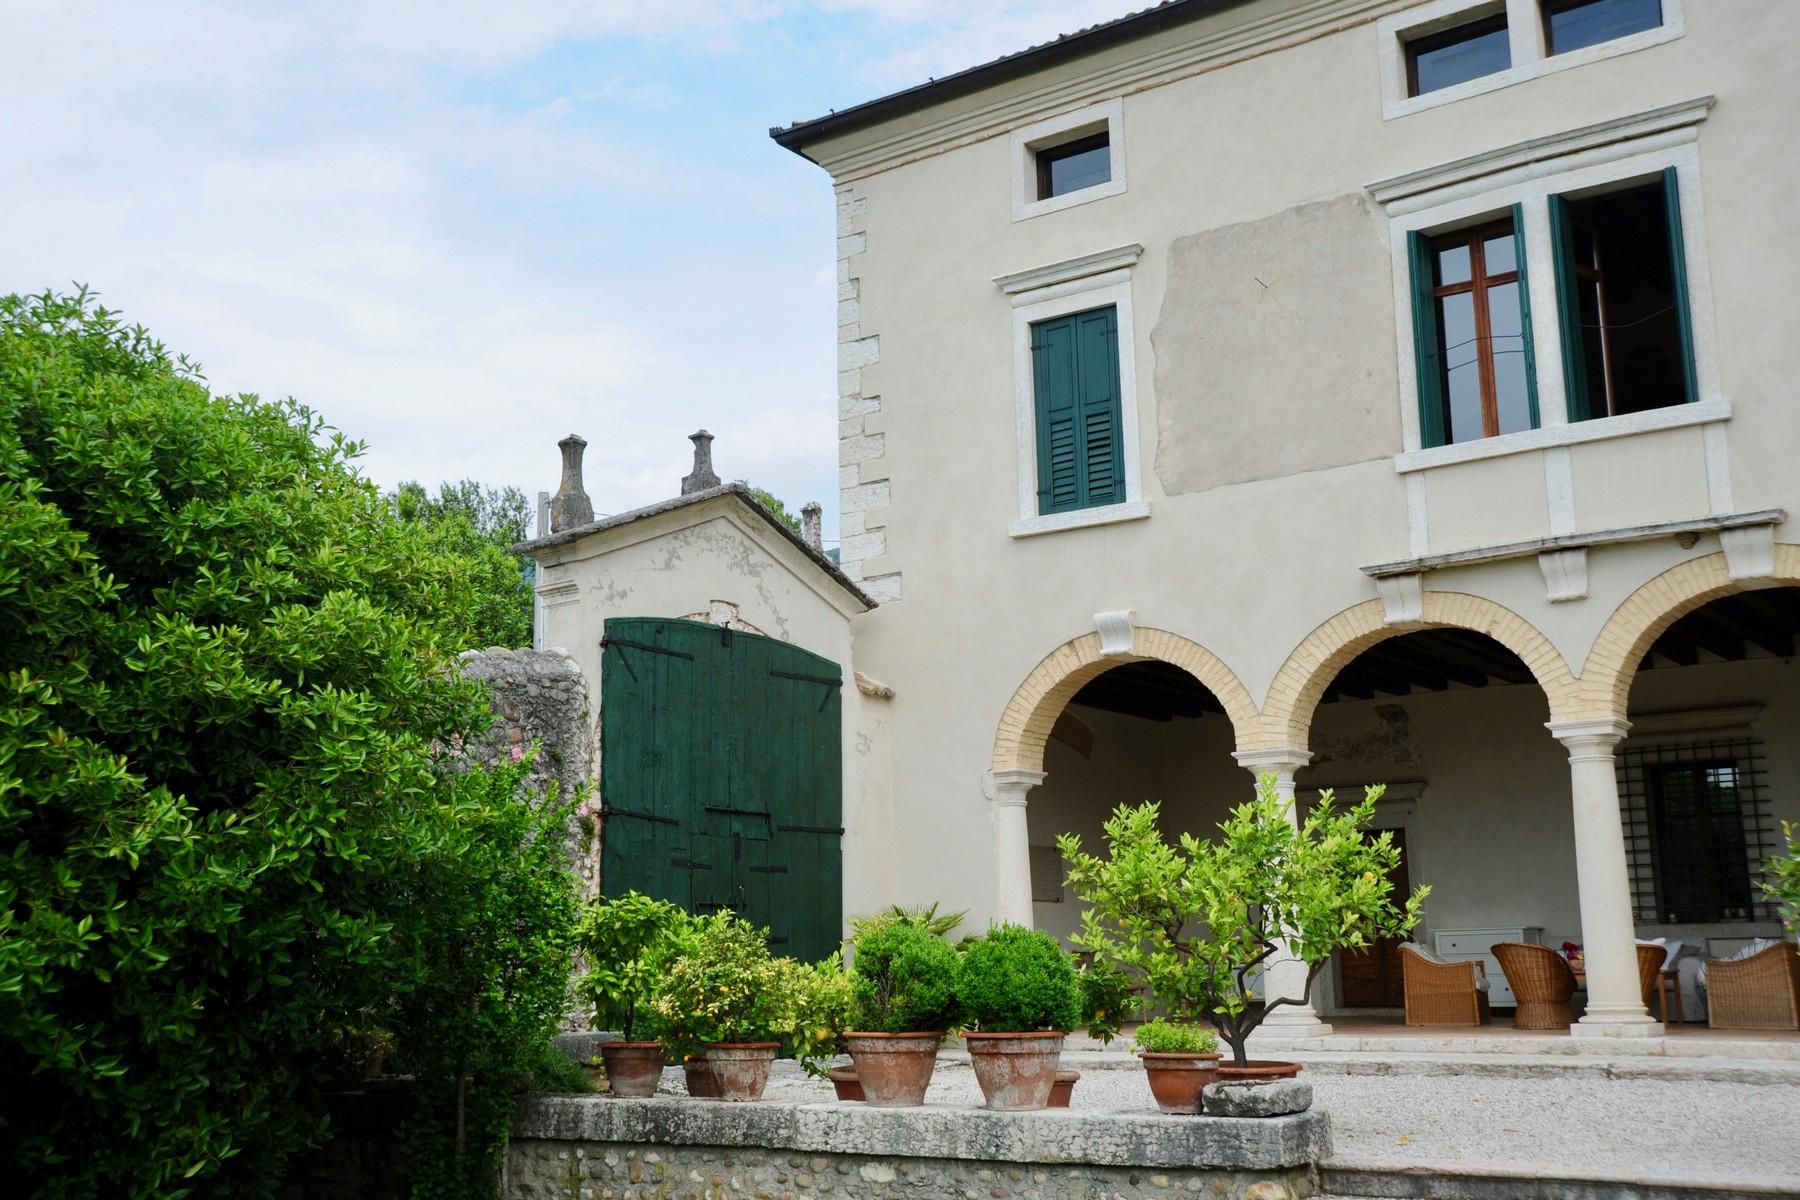 Villa in Vendita a Verona: 5 locali, 450 mq - Foto 27